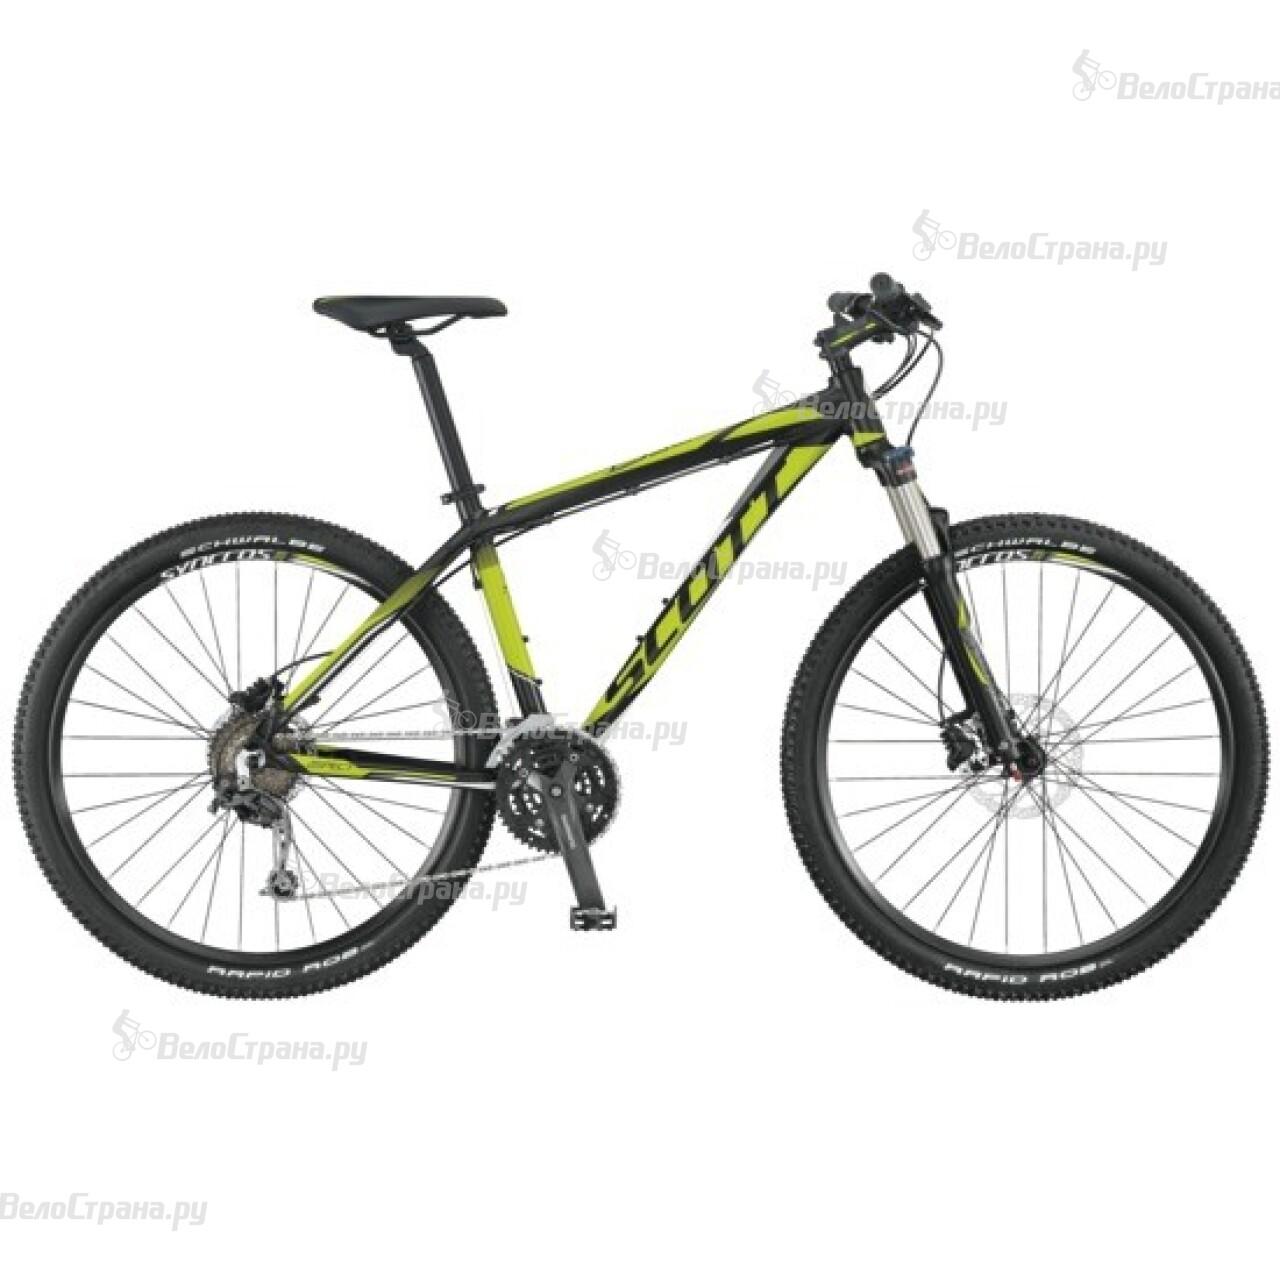 Велосипед Scott Aspect 730 (2014)